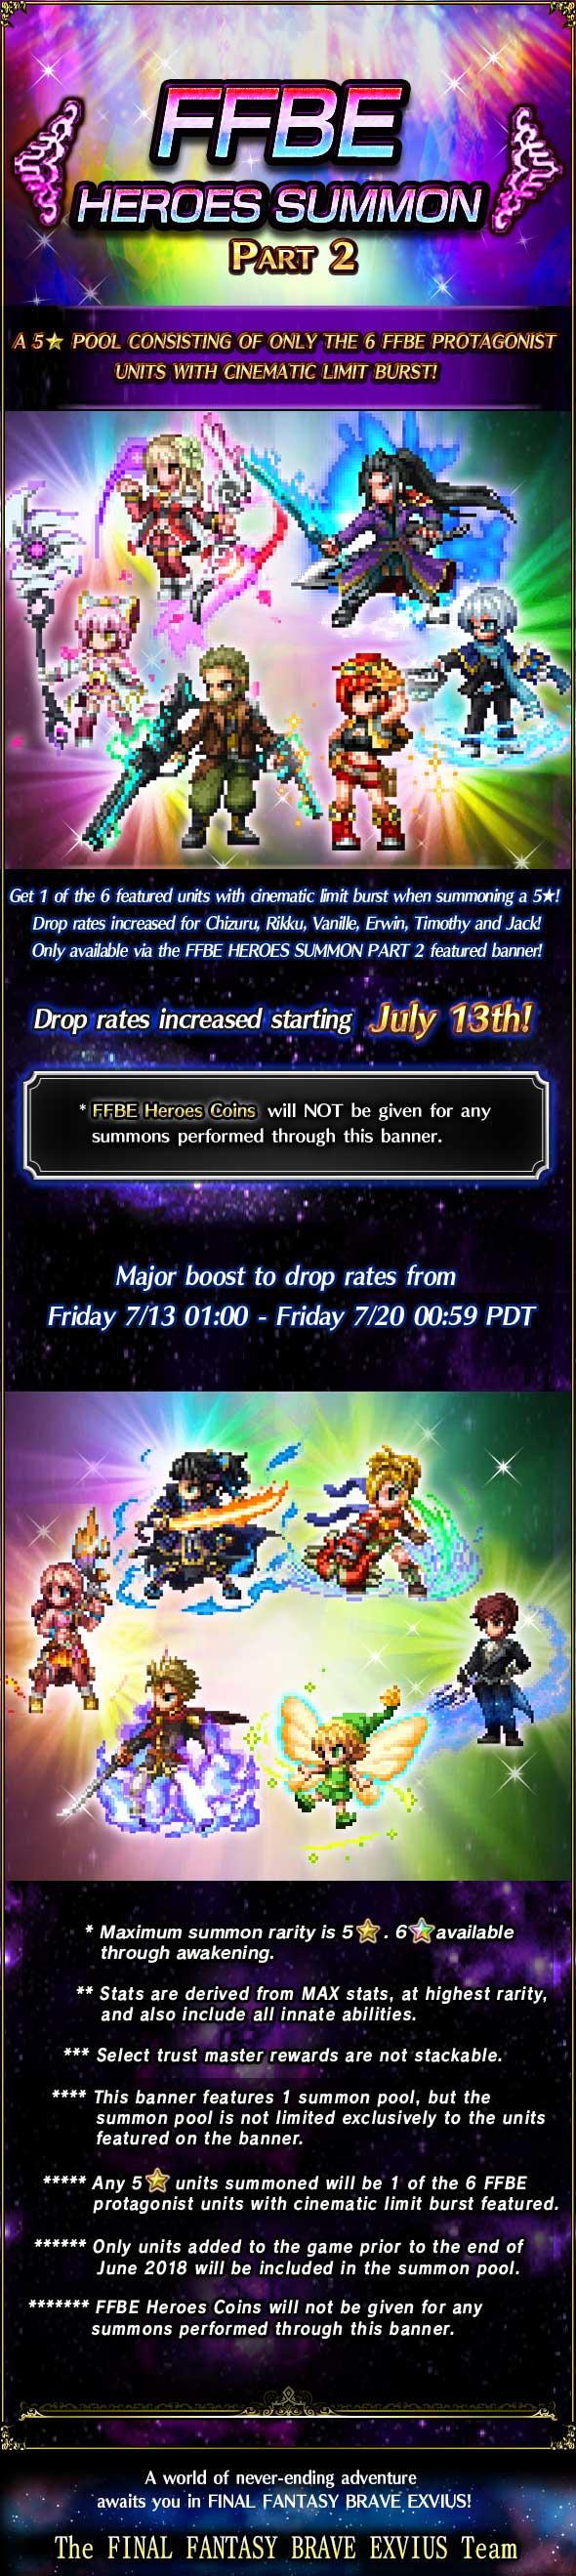 News/Archives - Final Fantasy Brave Exvius Wiki